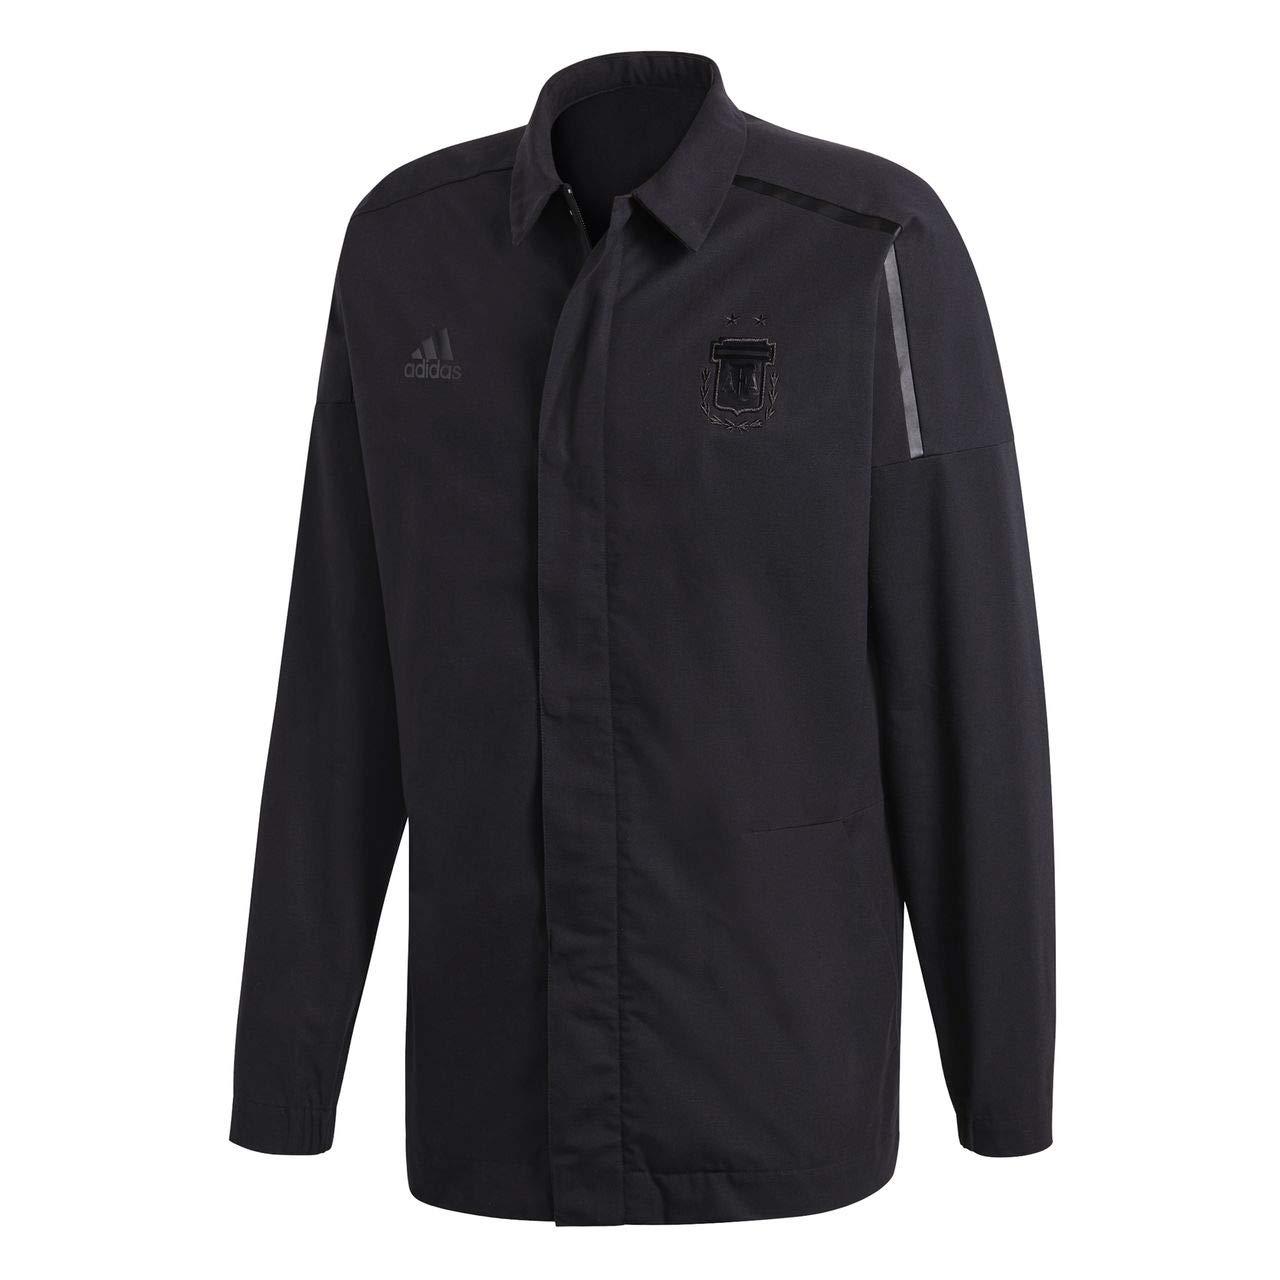 Adidas Woven Herren Z.n.e. Woven Adidas Argentinien Jacke eddc55